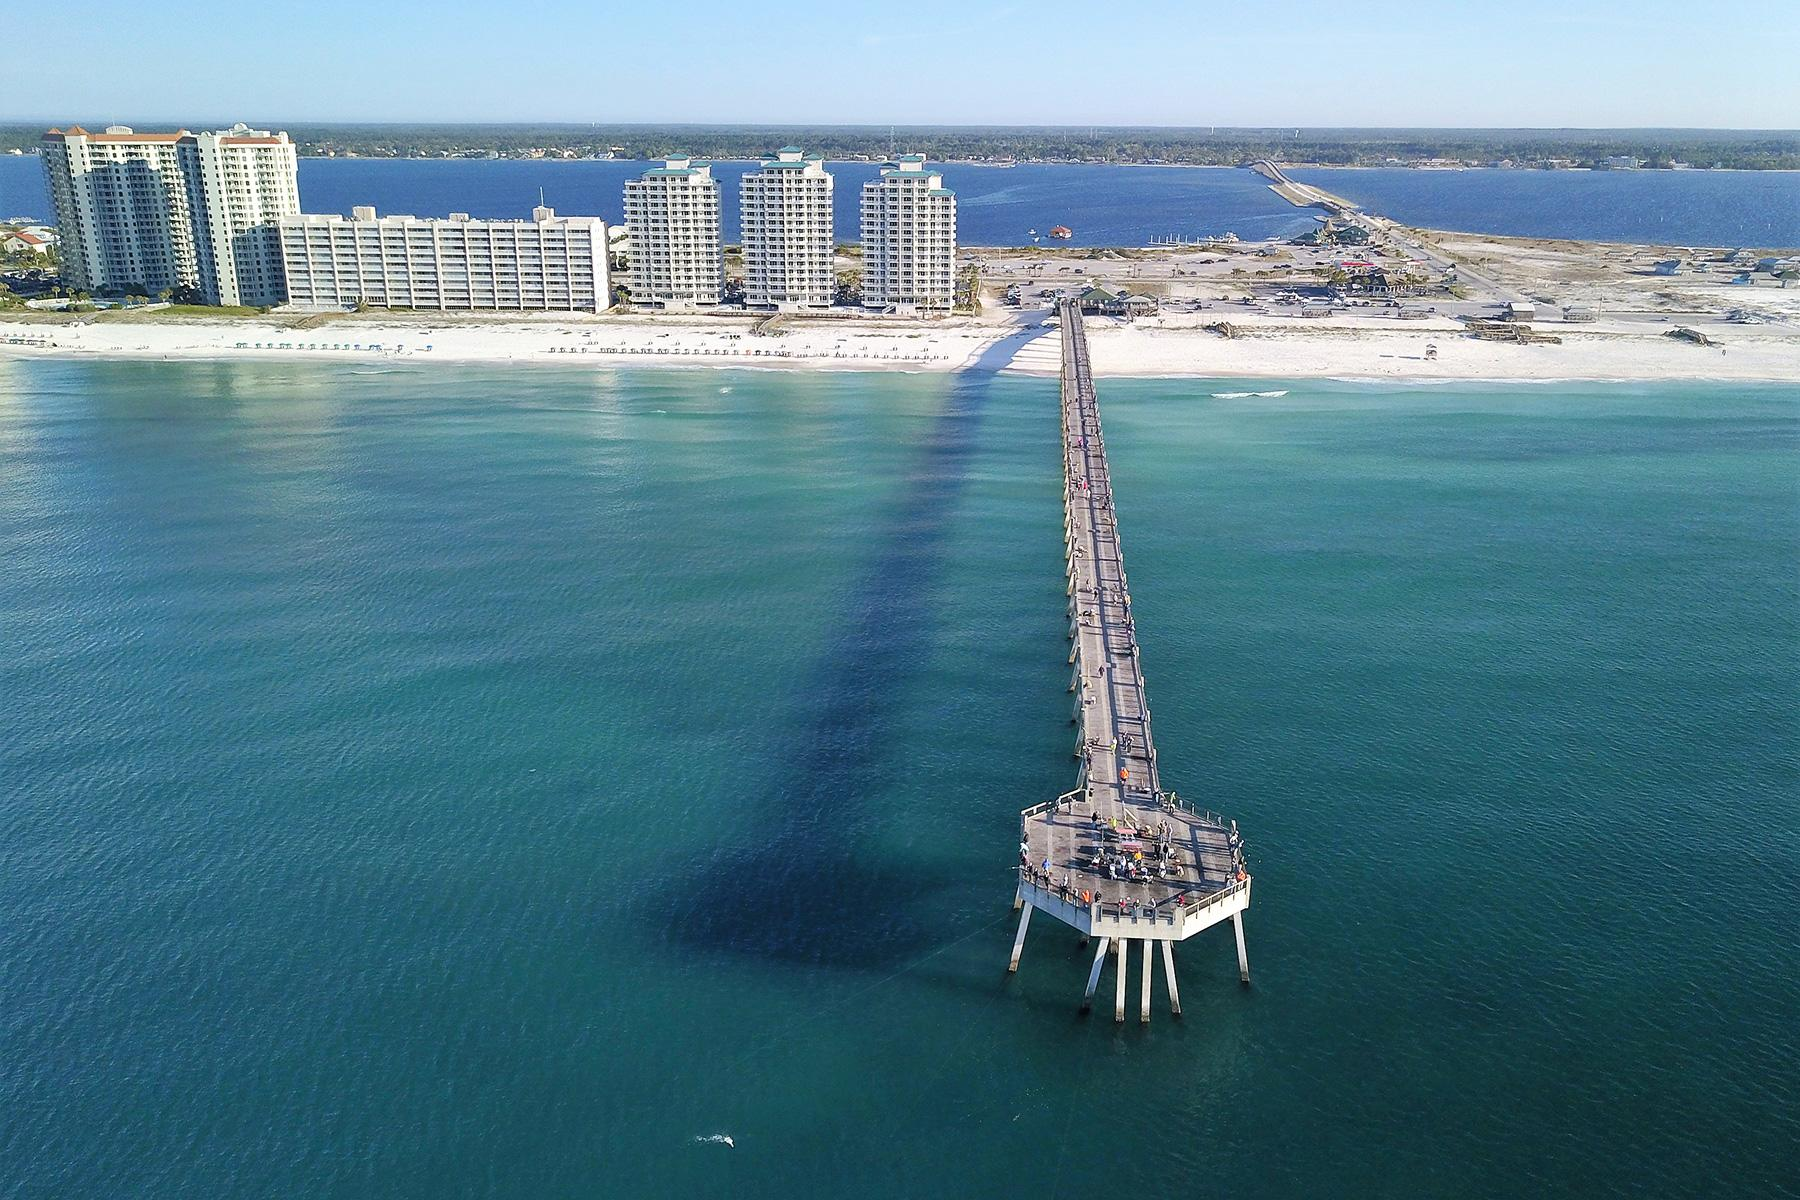 11 Under-the-Radar Florida Beach Towns to Visit This Winter